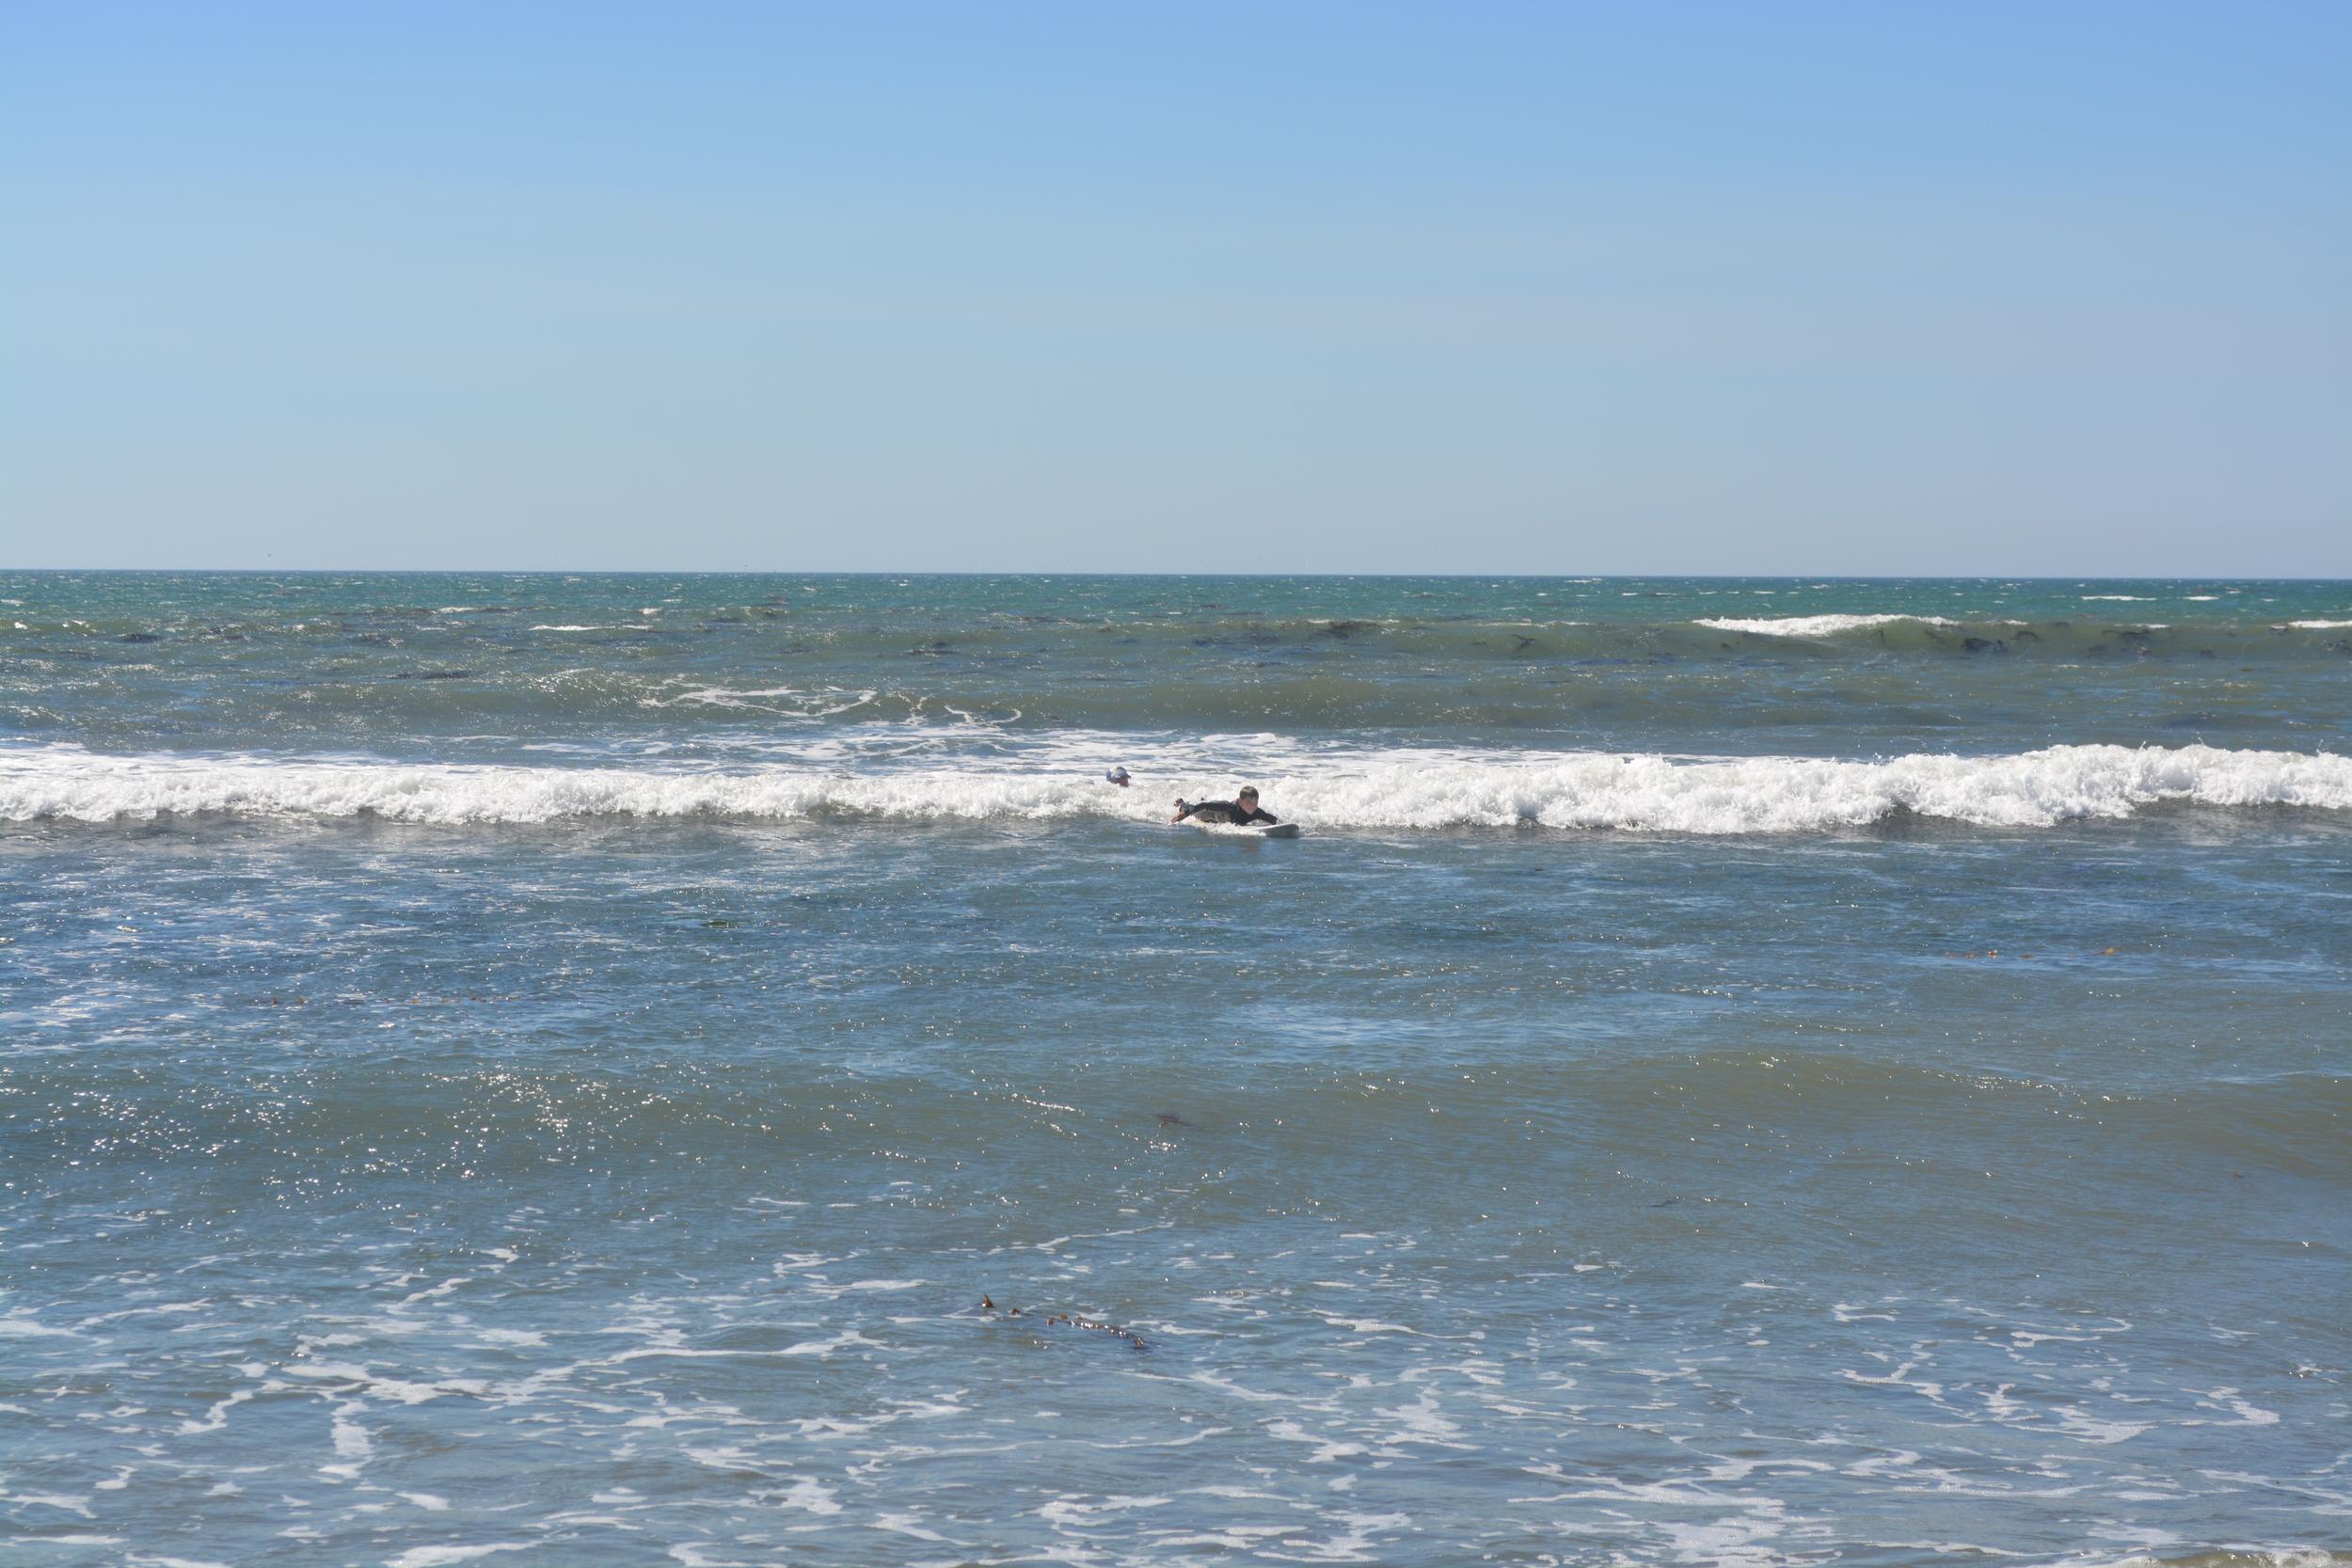 Baja California 10-5-13 Shipwrecks Surfing Adventure Ocean Experience Surf School San Diego (9).JPG